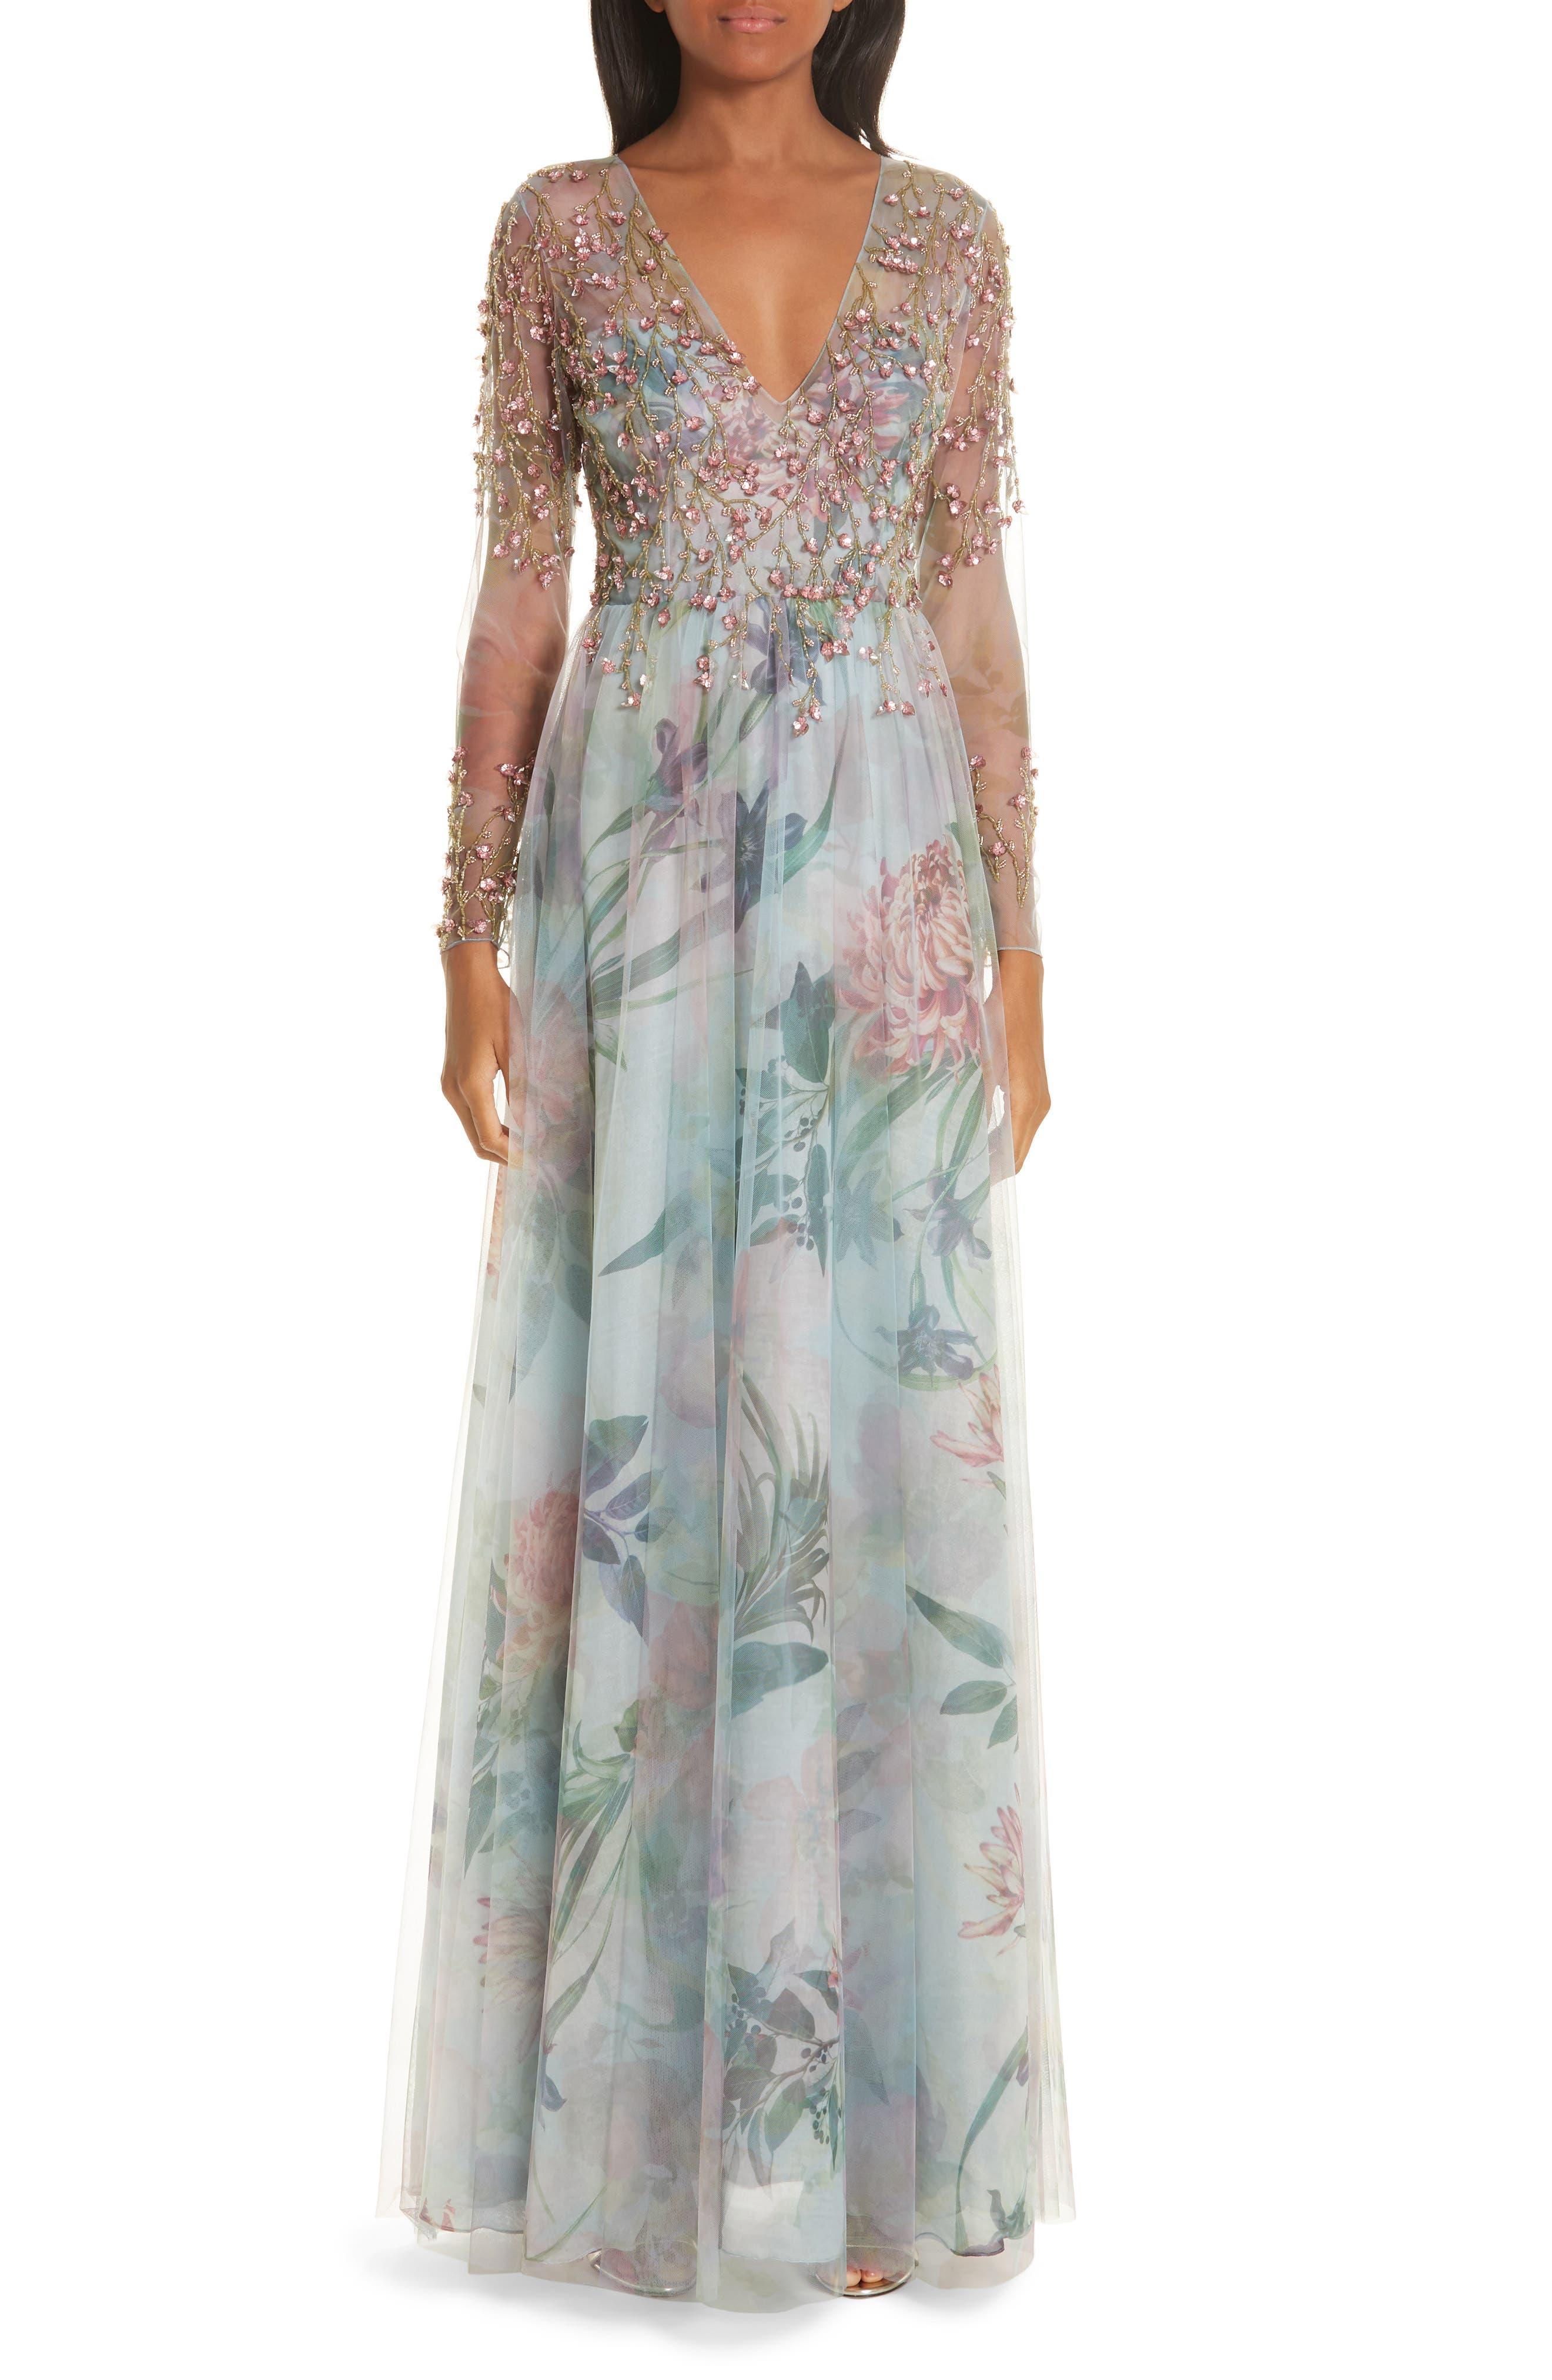 Patbo Beaded Floral Print A-Line Evening Dress, 6 BR - Blue